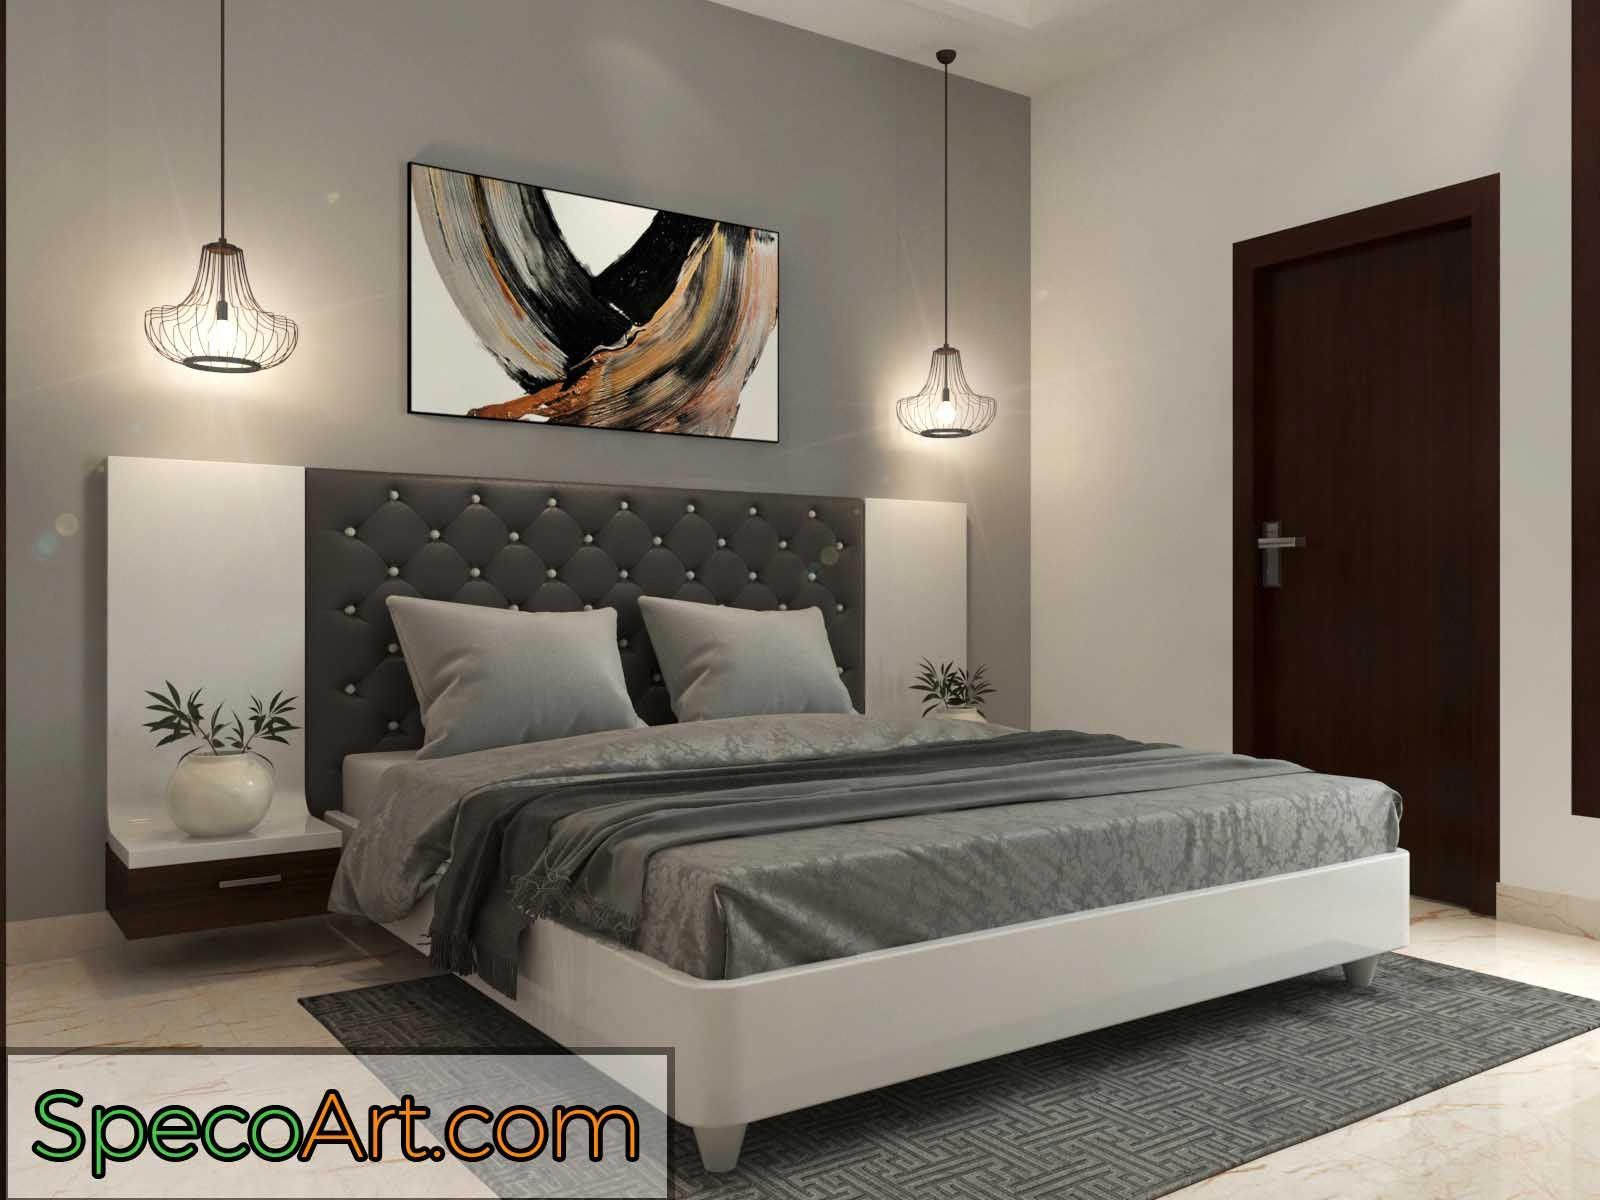 Modern bedroom designs ideas for more views visit our website